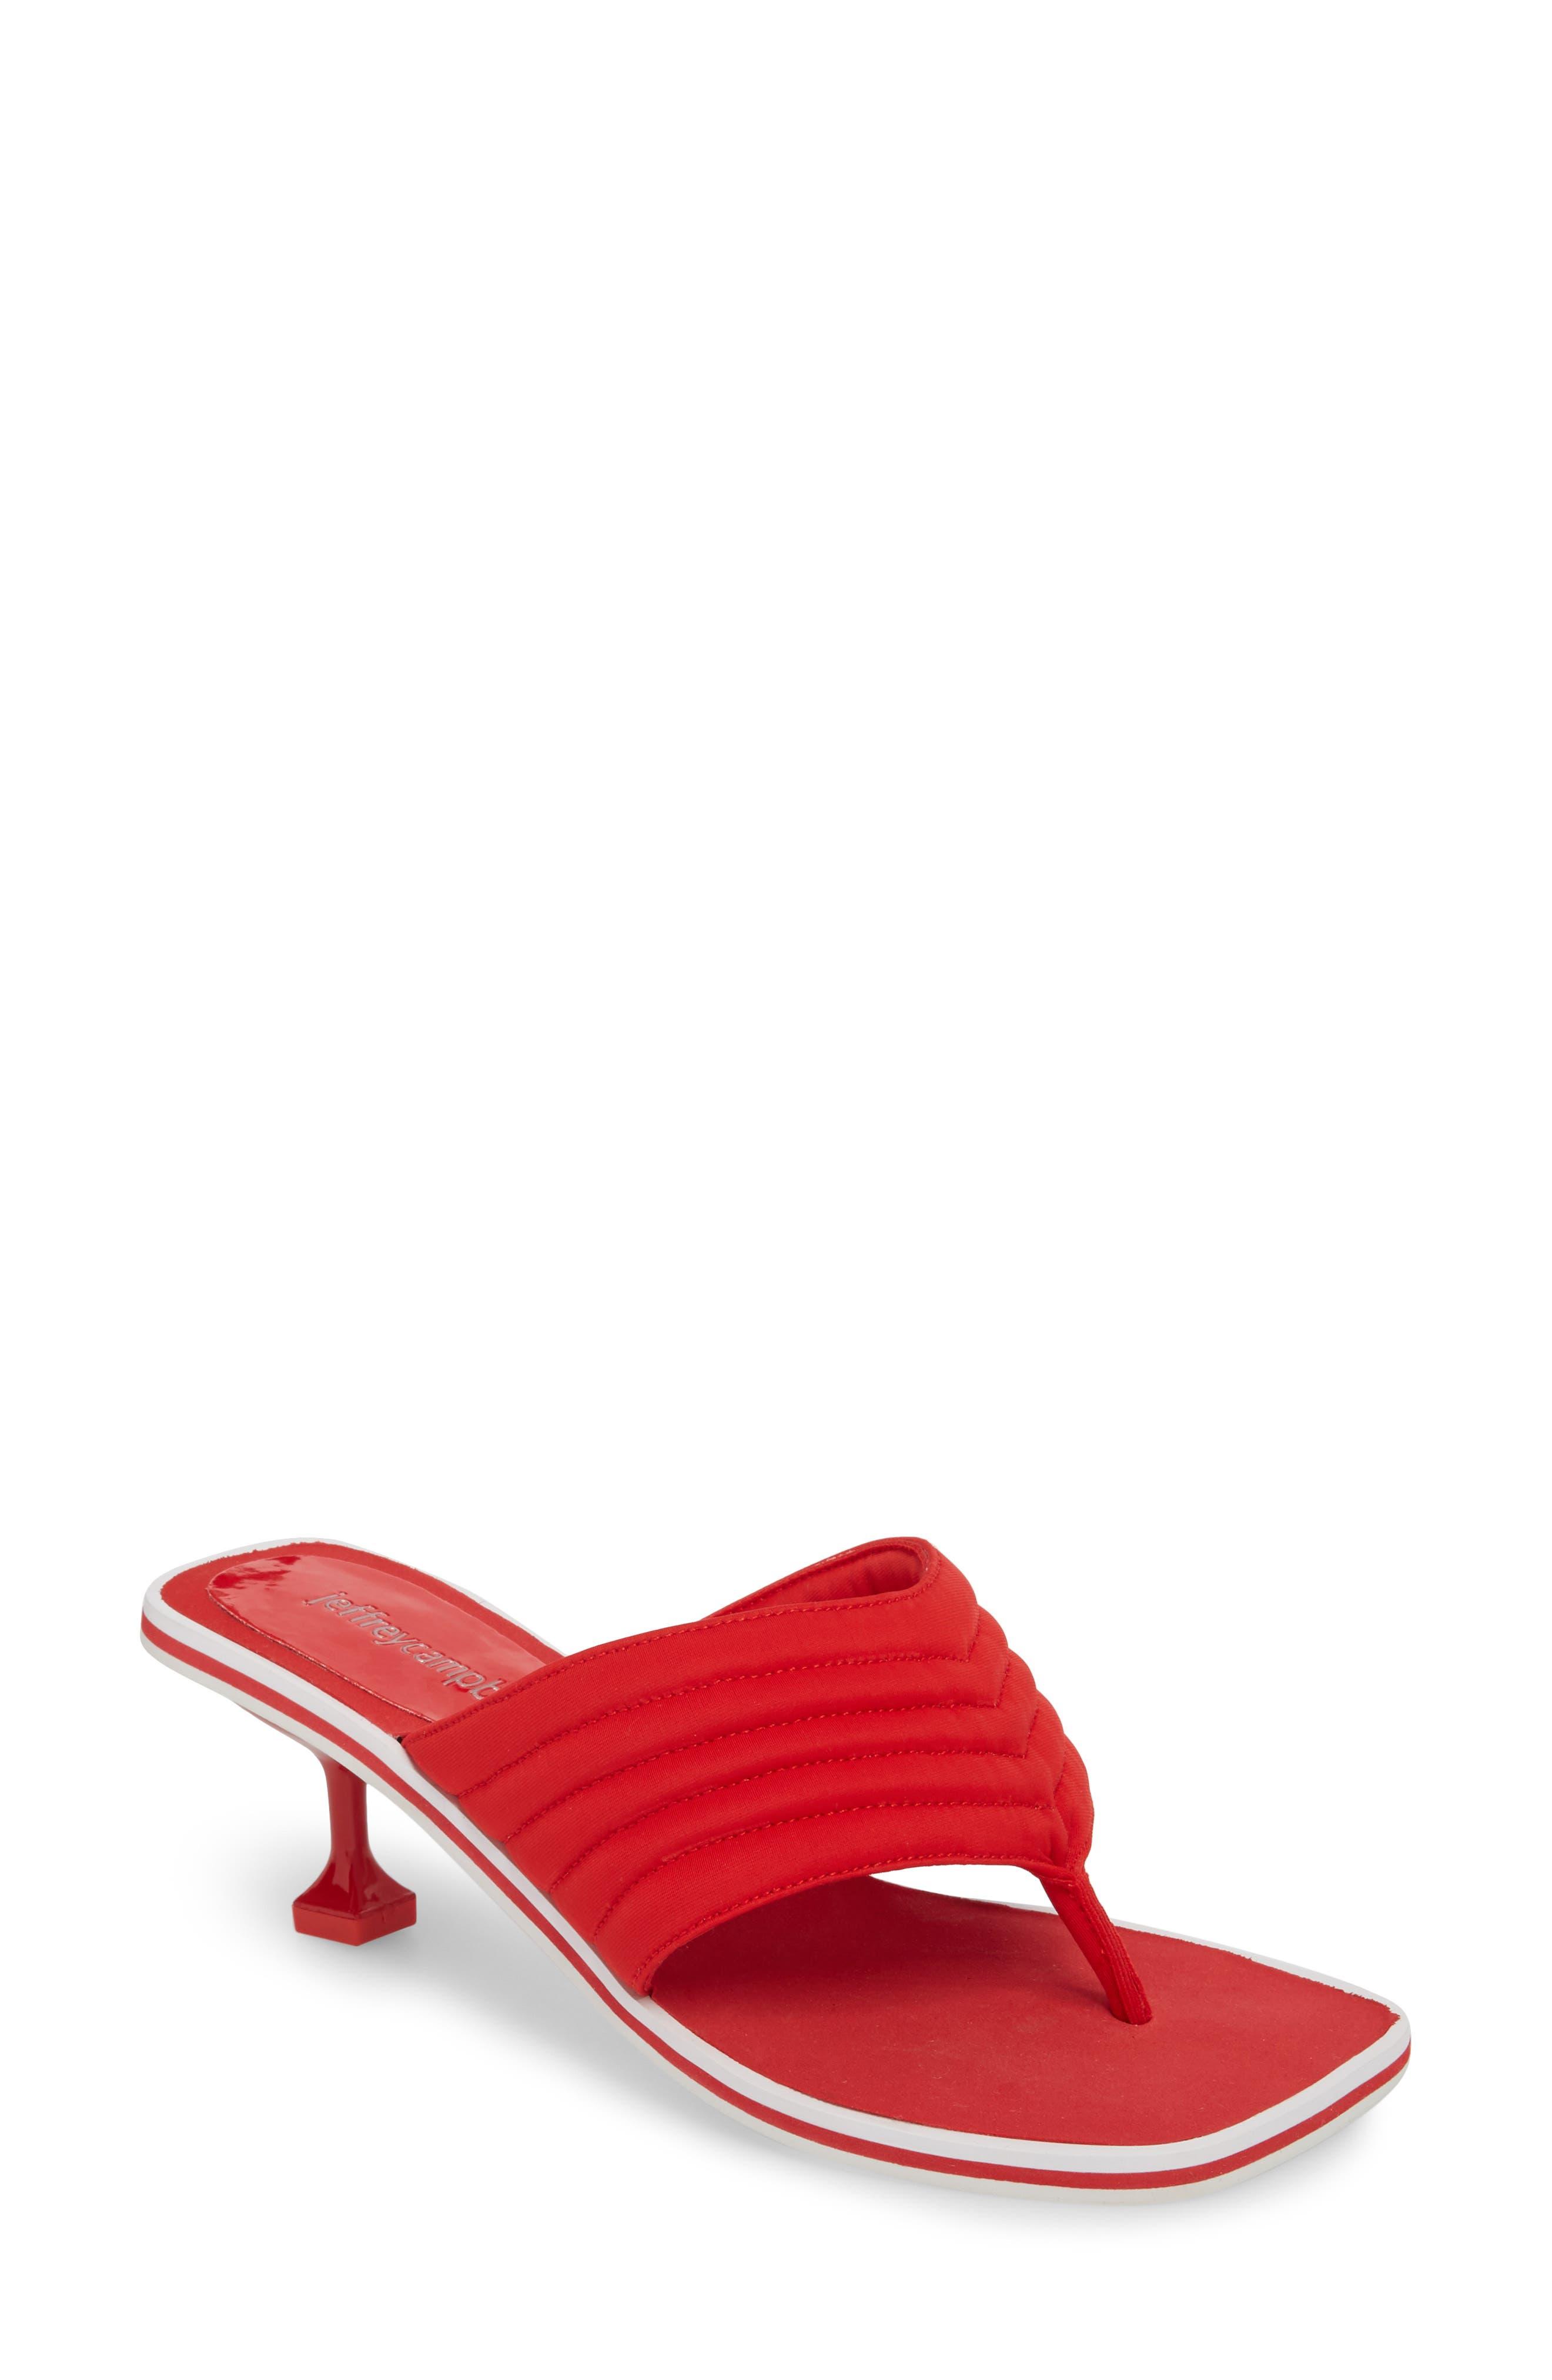 Overtime Sandal,                         Main,                         color, 645